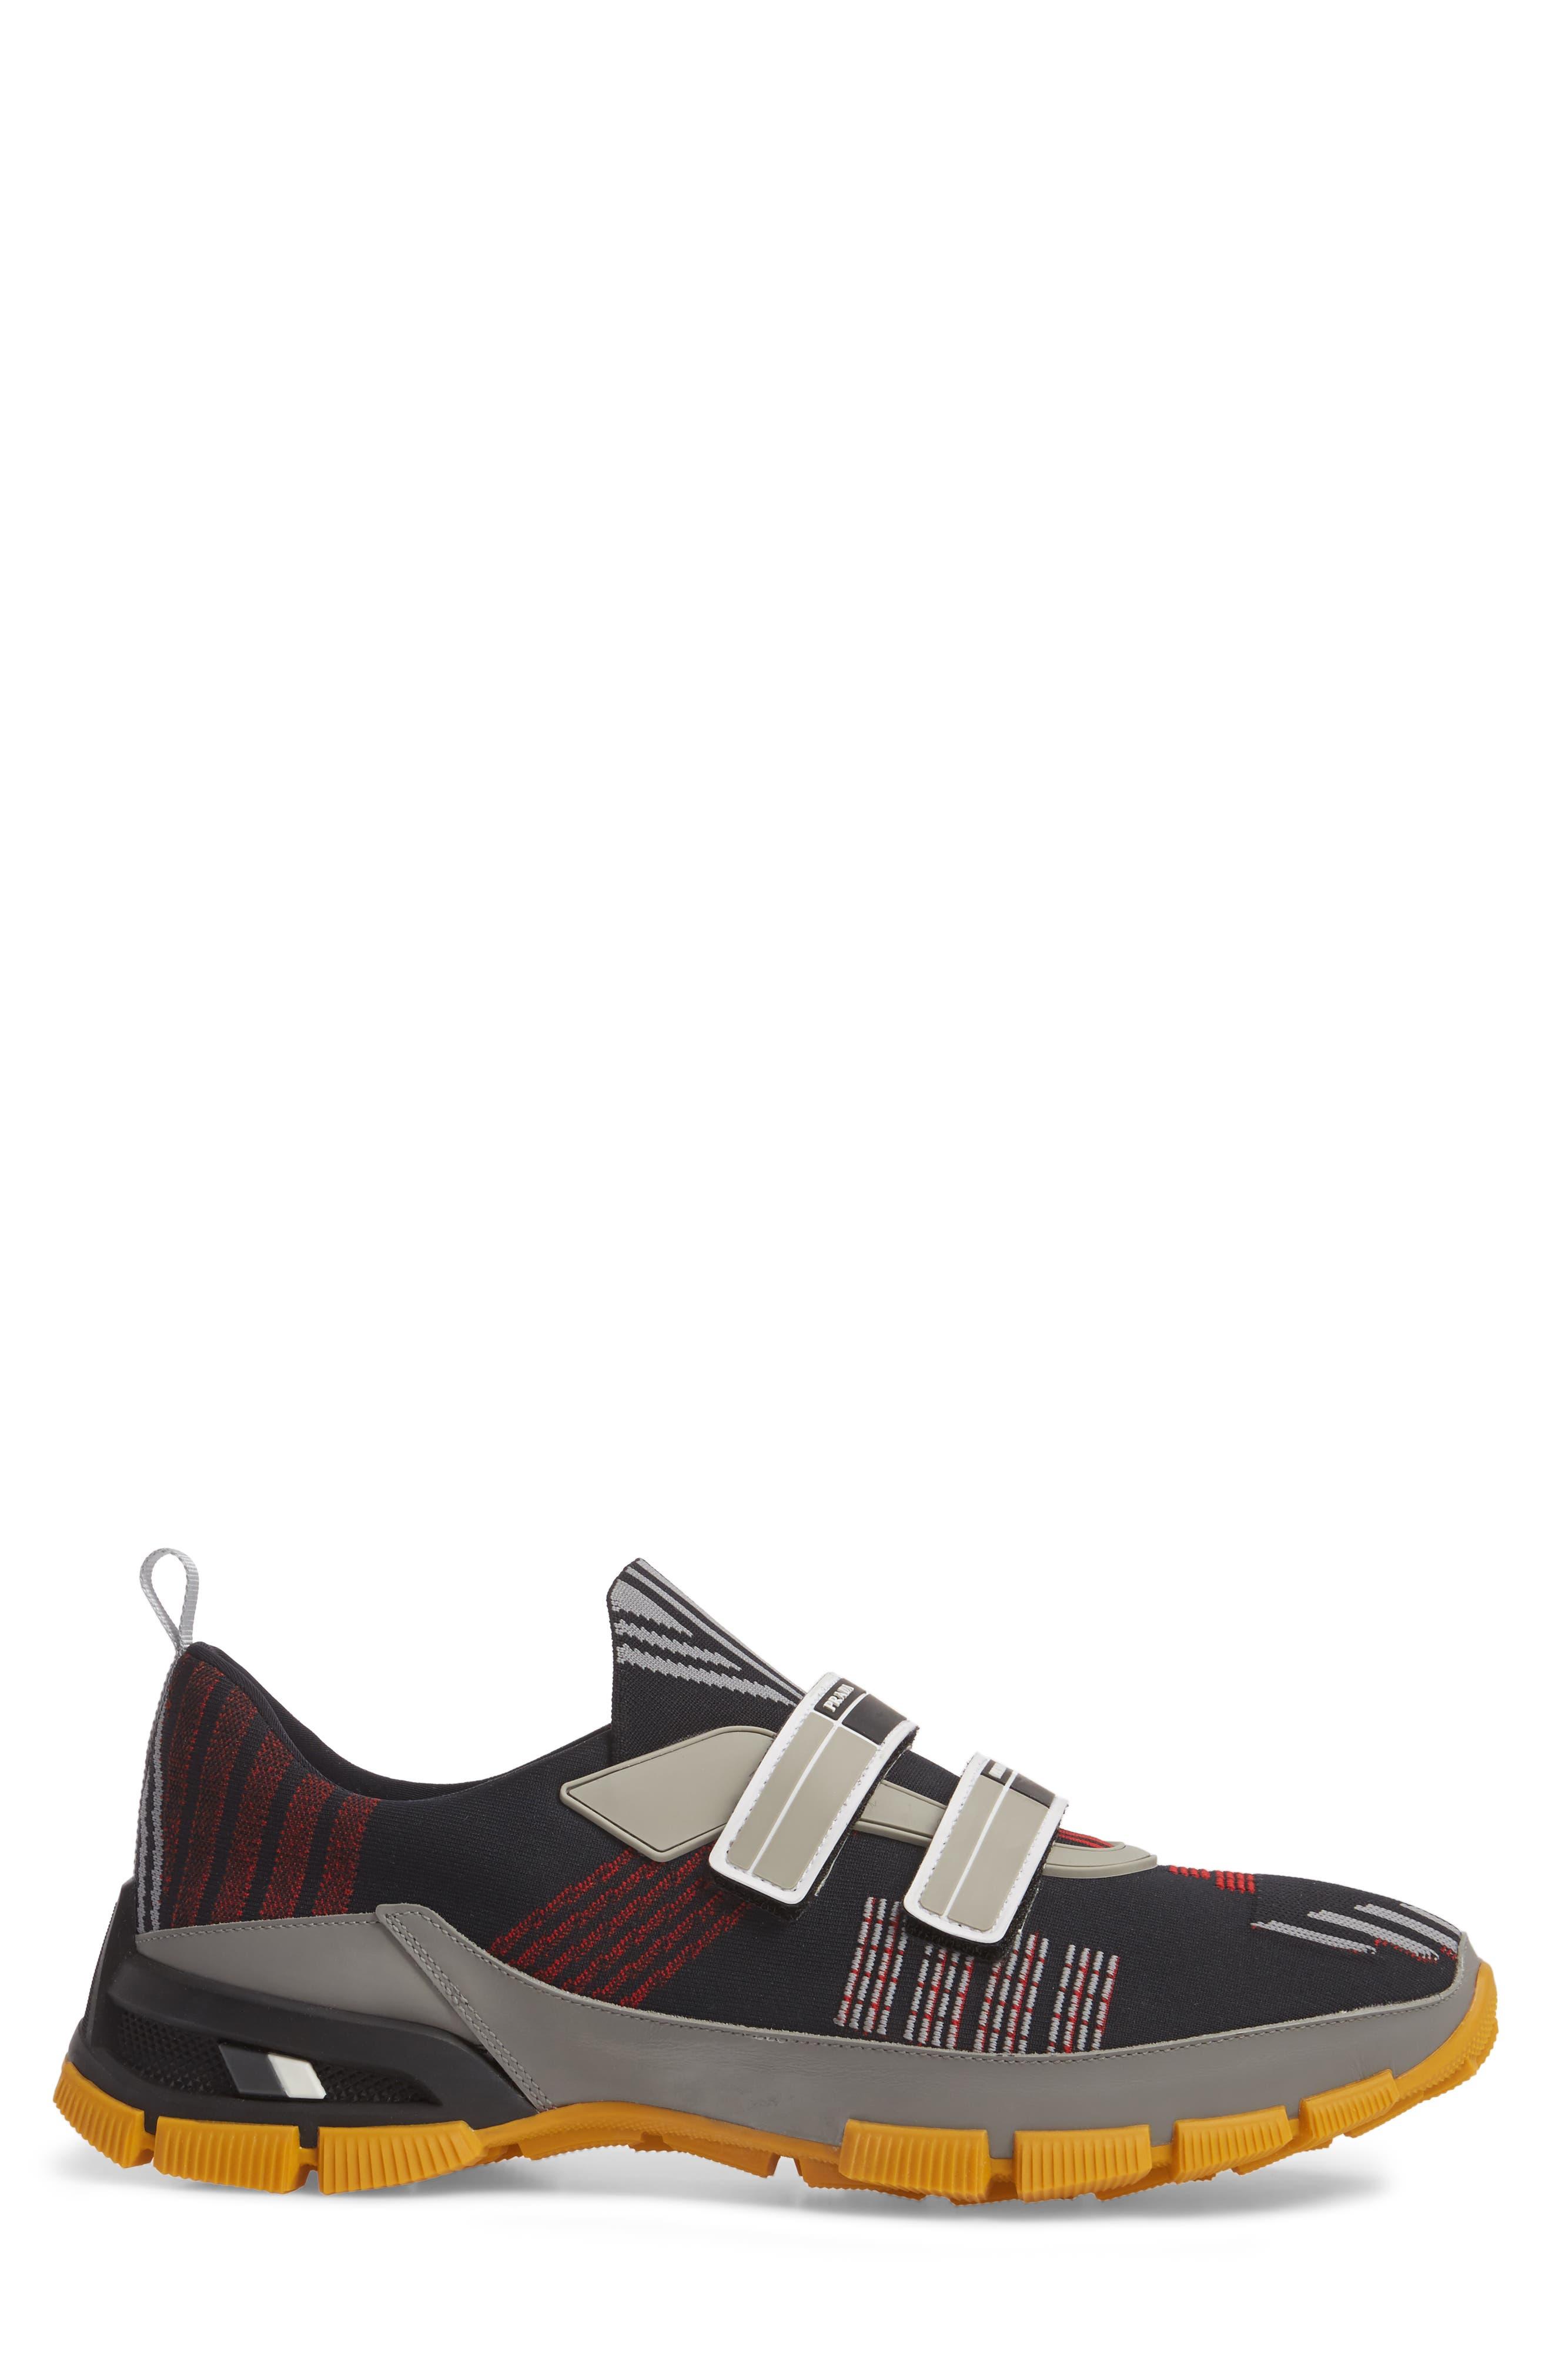 Linea Rossa Strap Sneaker,                             Alternate thumbnail 3, color,                             001